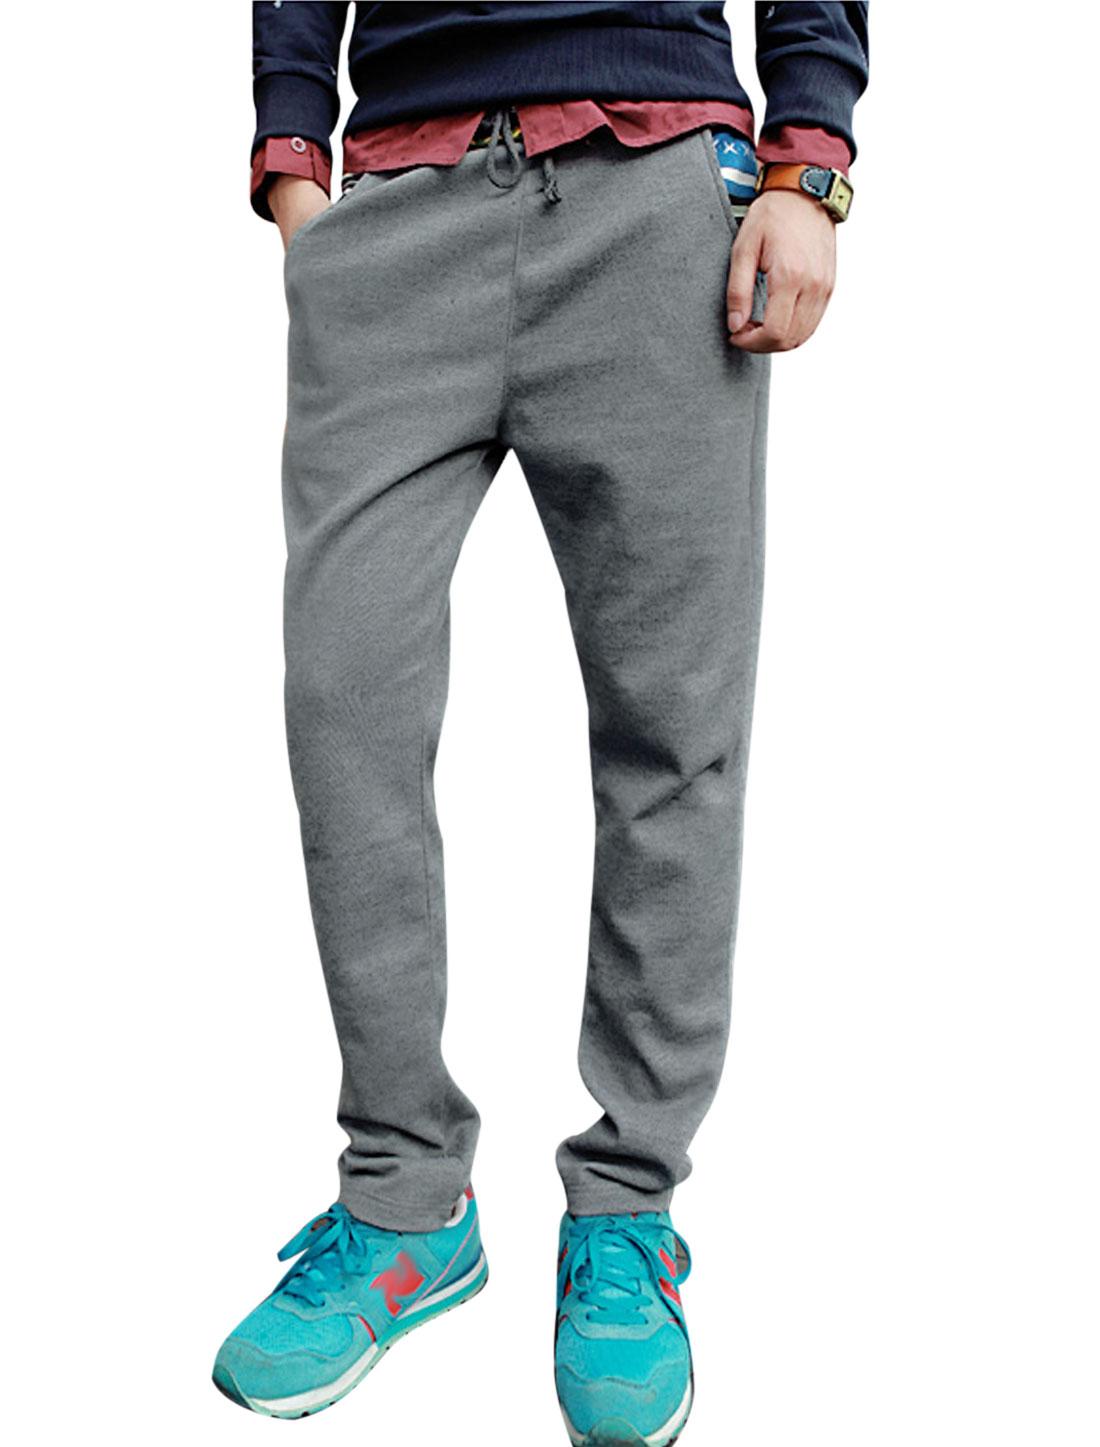 Men Striped-Waist w Single Pocket Back Relaxed Leisure Pants Gray W30